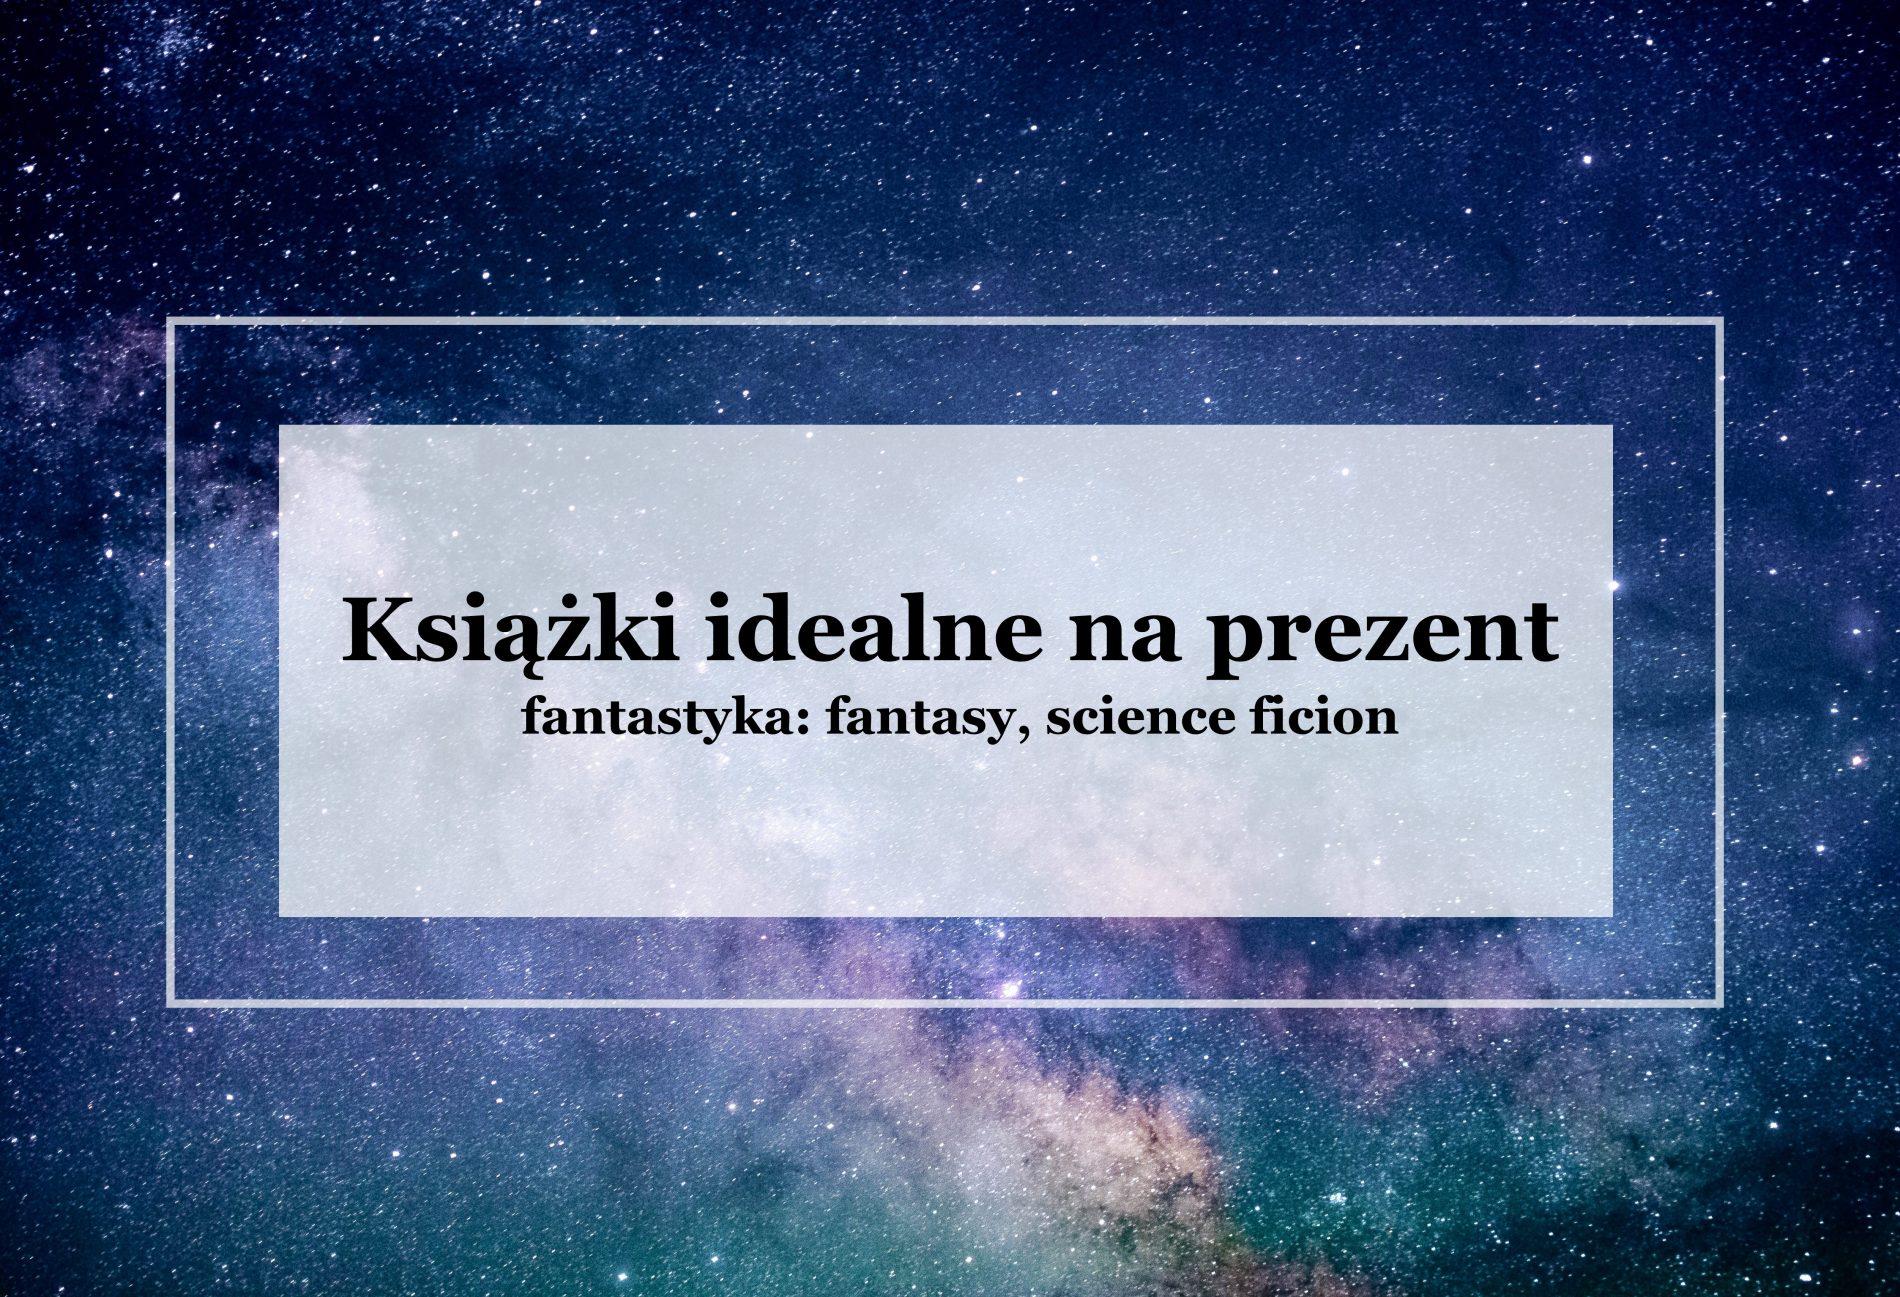 literatura-fantastyczna-idealna-prezent